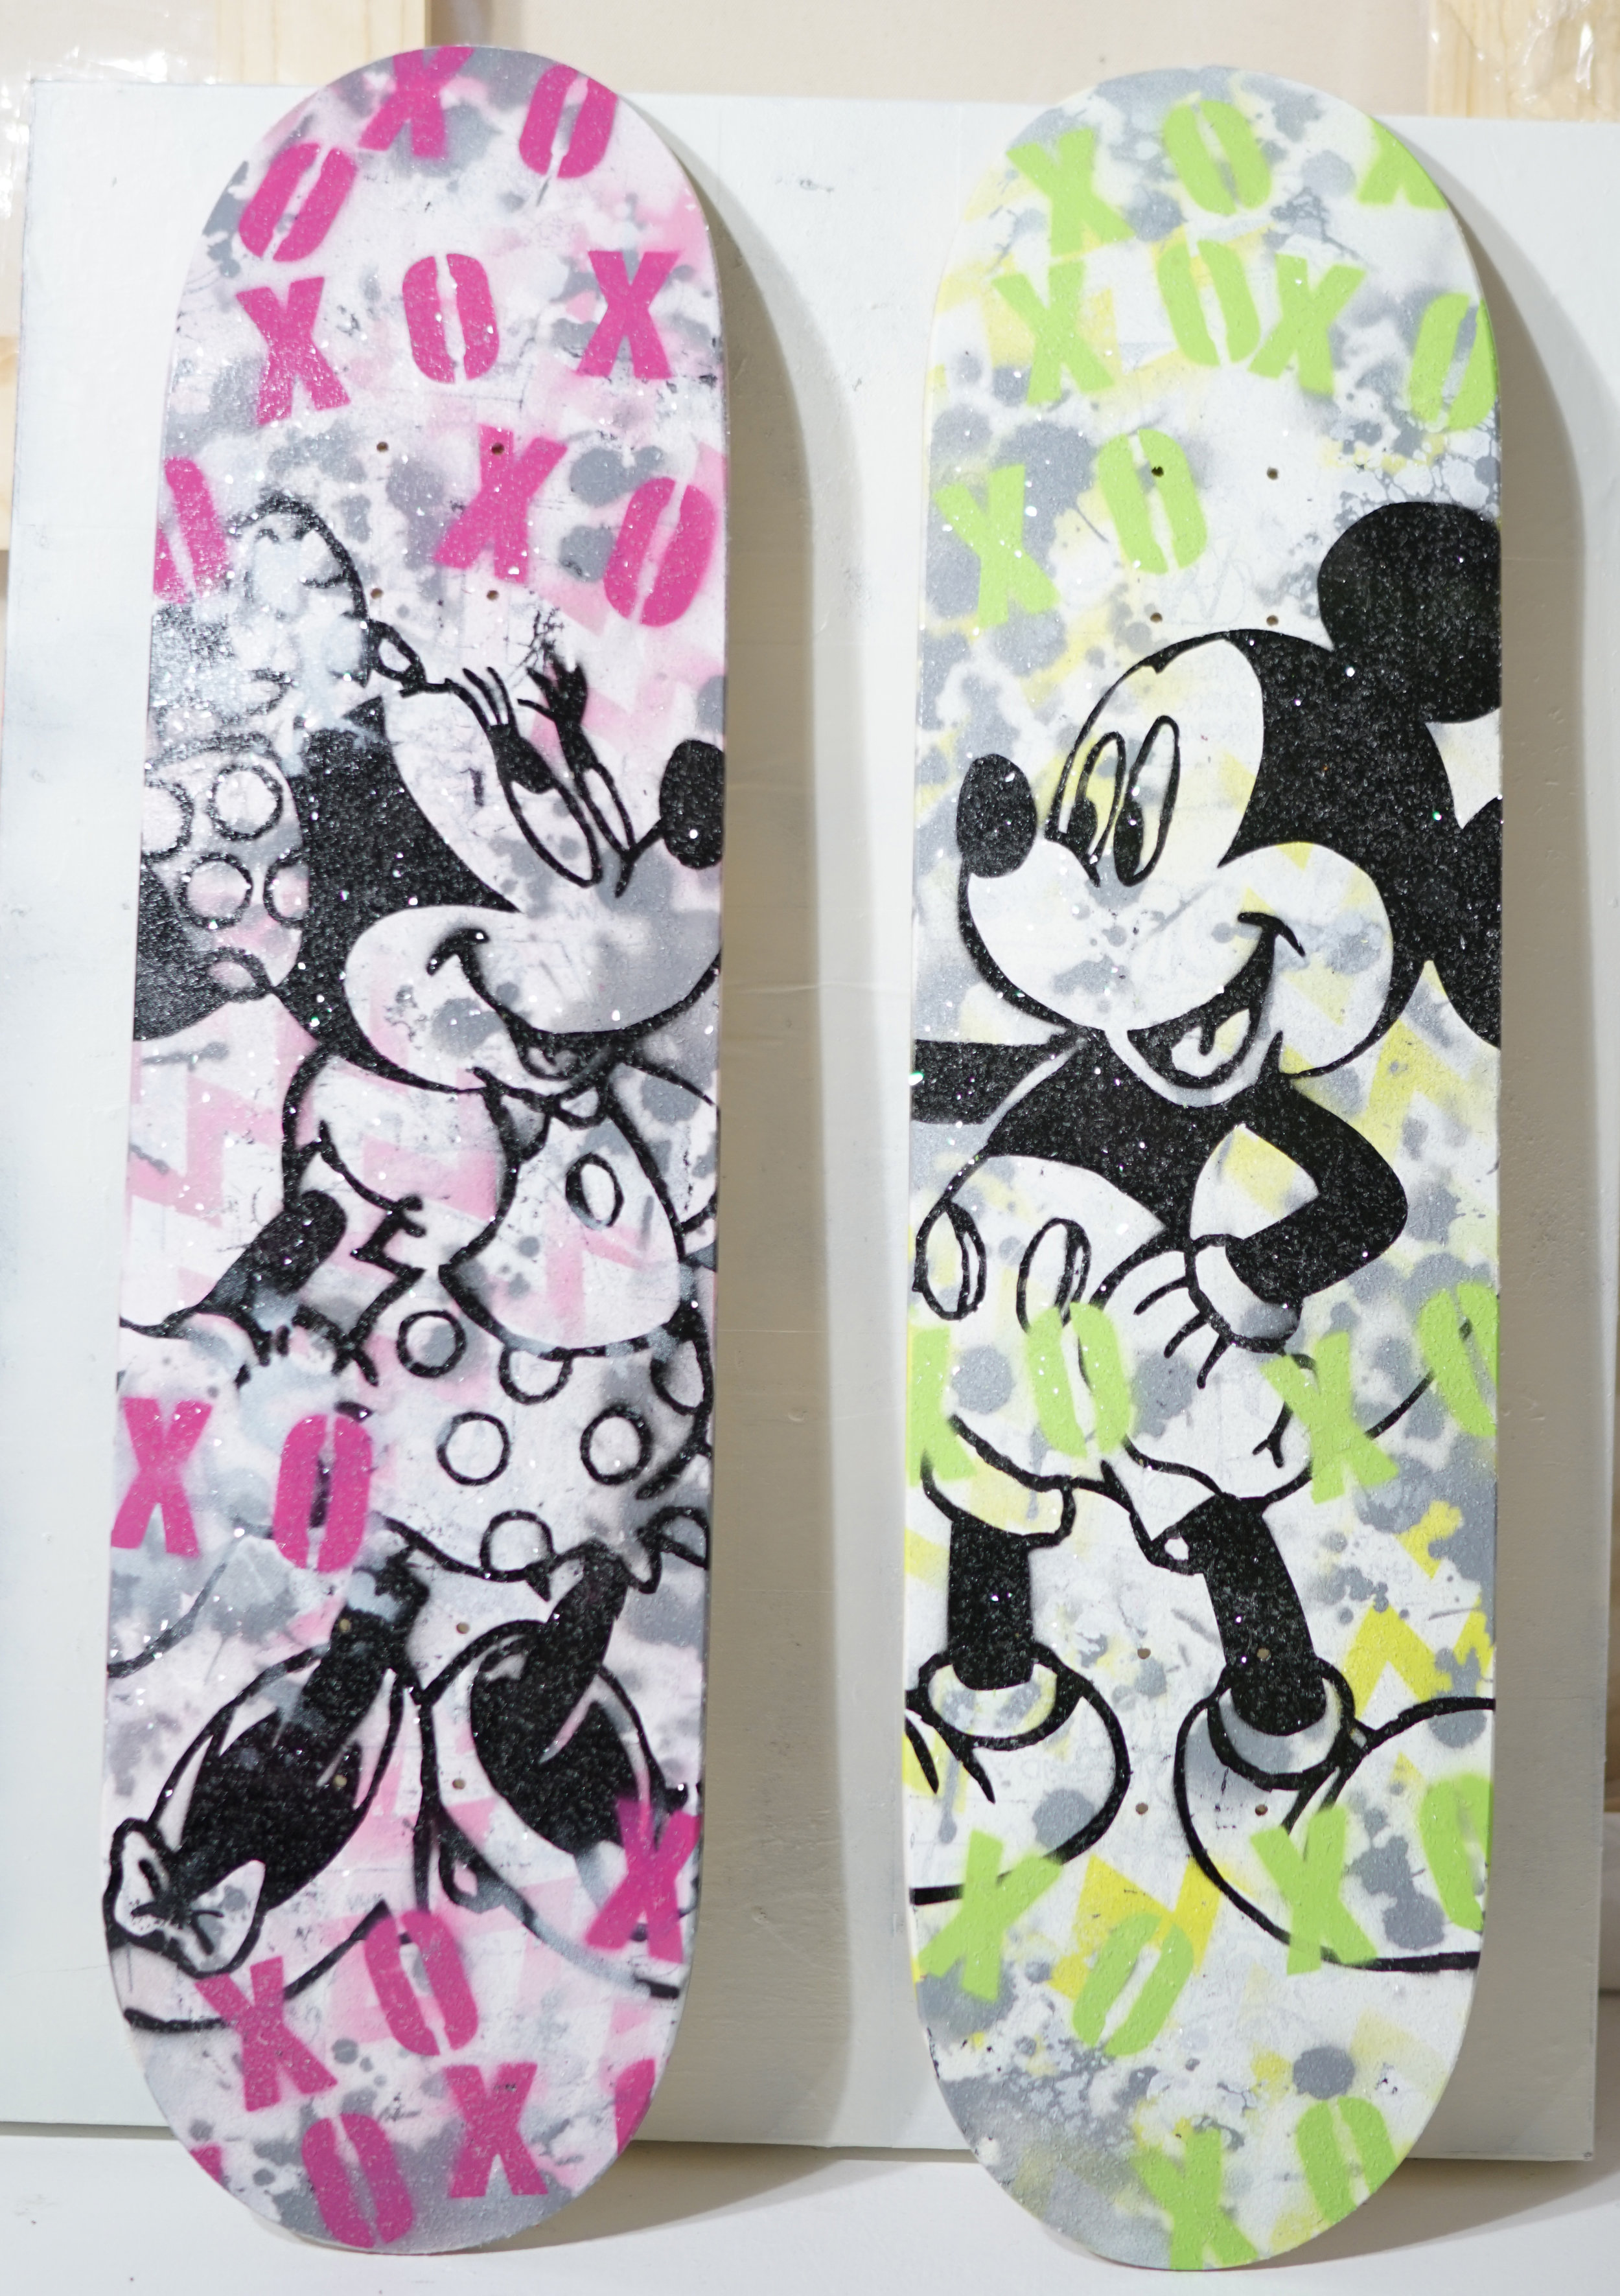 Jared Schwalb_XOXO_2018_8.5 x 33_Spray Paint,  Diamond Dust On Skate Deck_$2,850 pair_$1,500 each .jpg